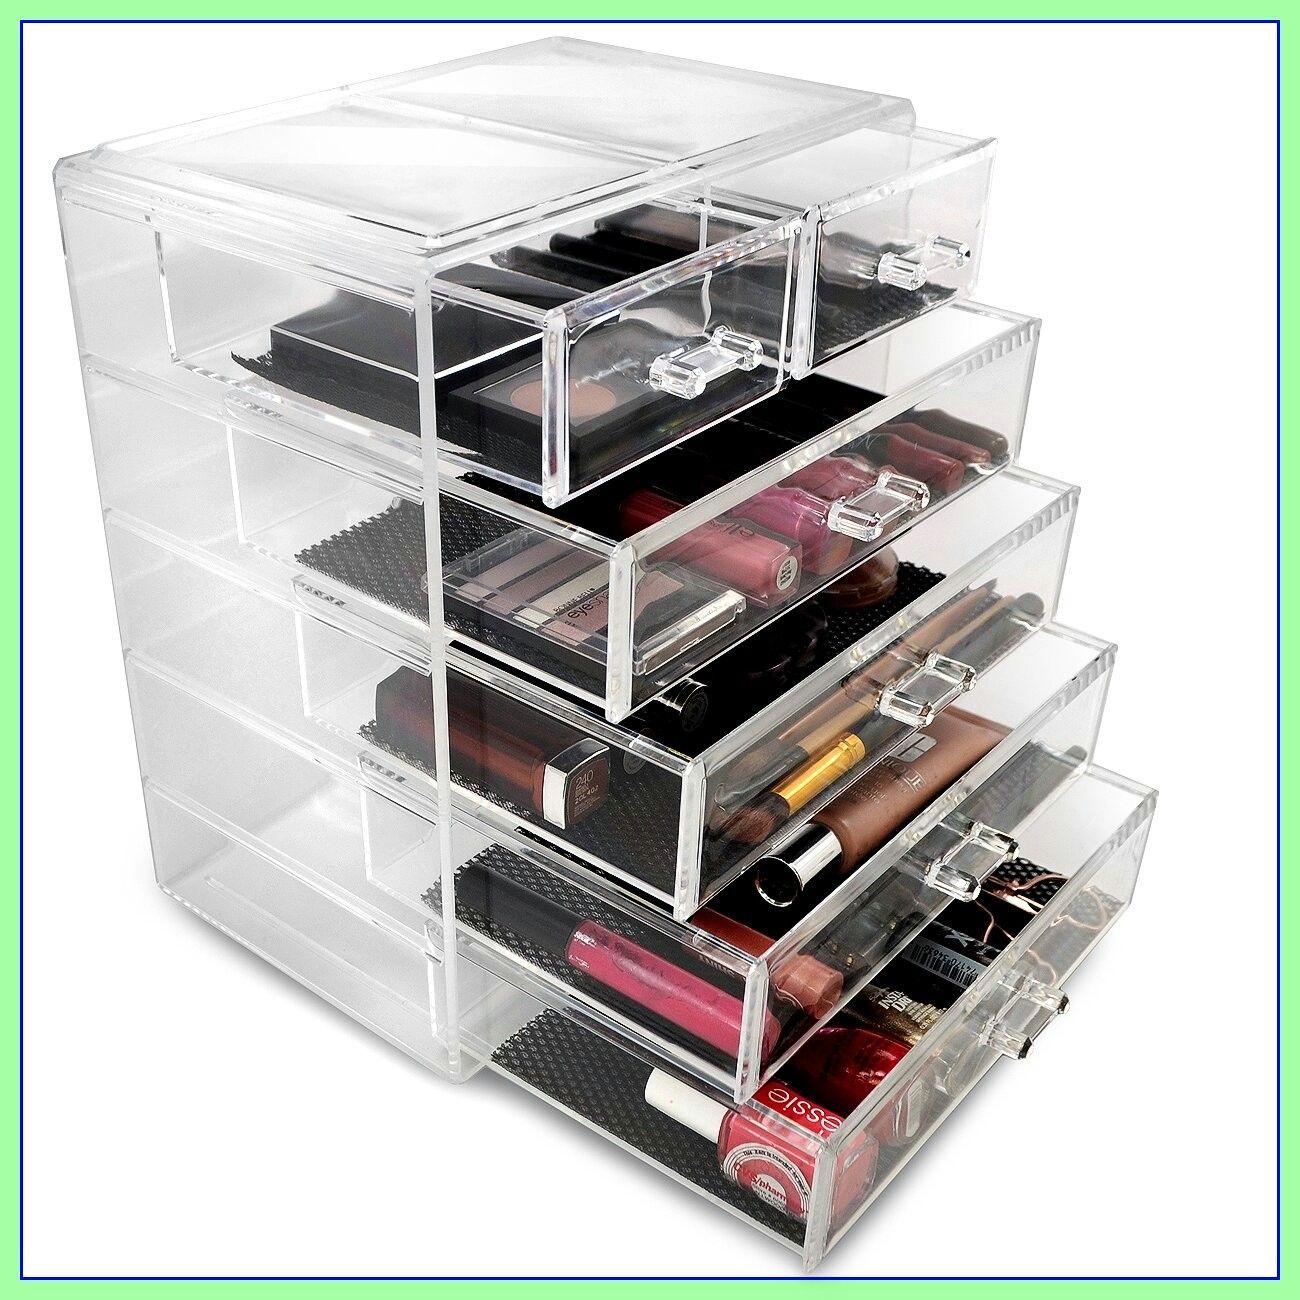 111 Reference Of Drawer Makeup Organizer In 2020 Makeup Jewellery Storage Makeup Storage Display Makeup Storage Case